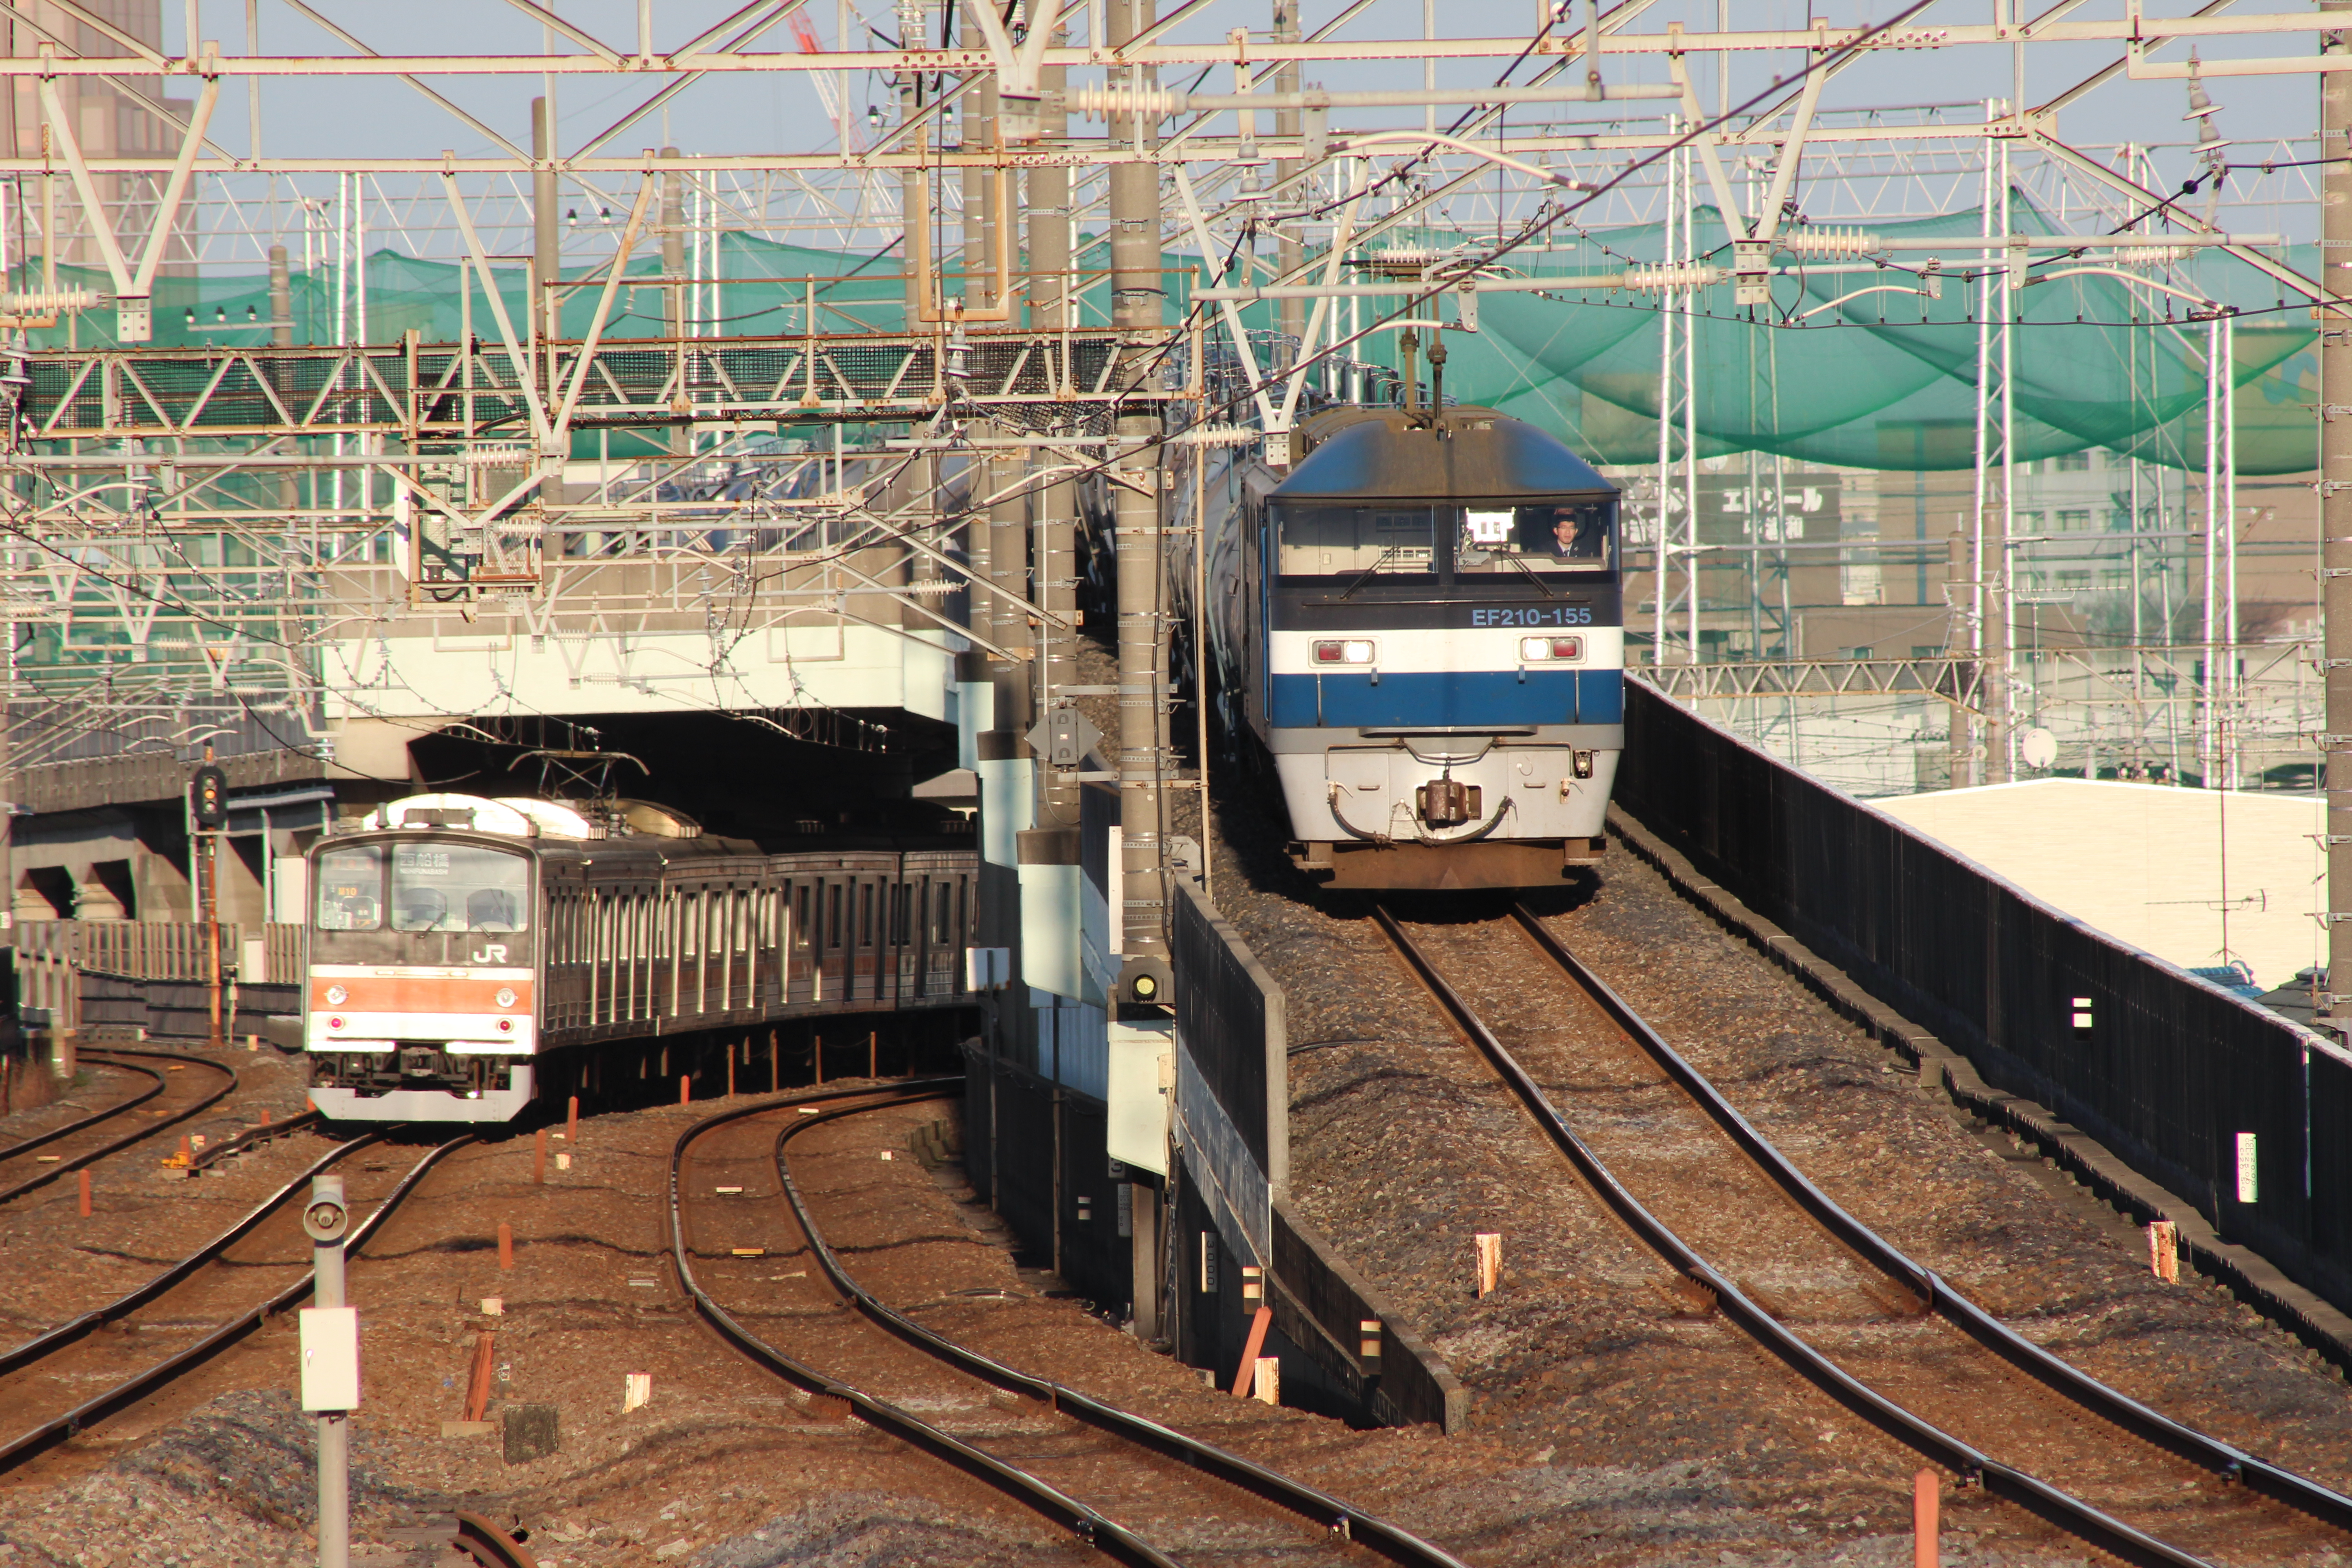 https://upload.wikimedia.org/wikipedia/commons/7/7d/Nishi-Urawa_Station_Junction_20121208.jpg